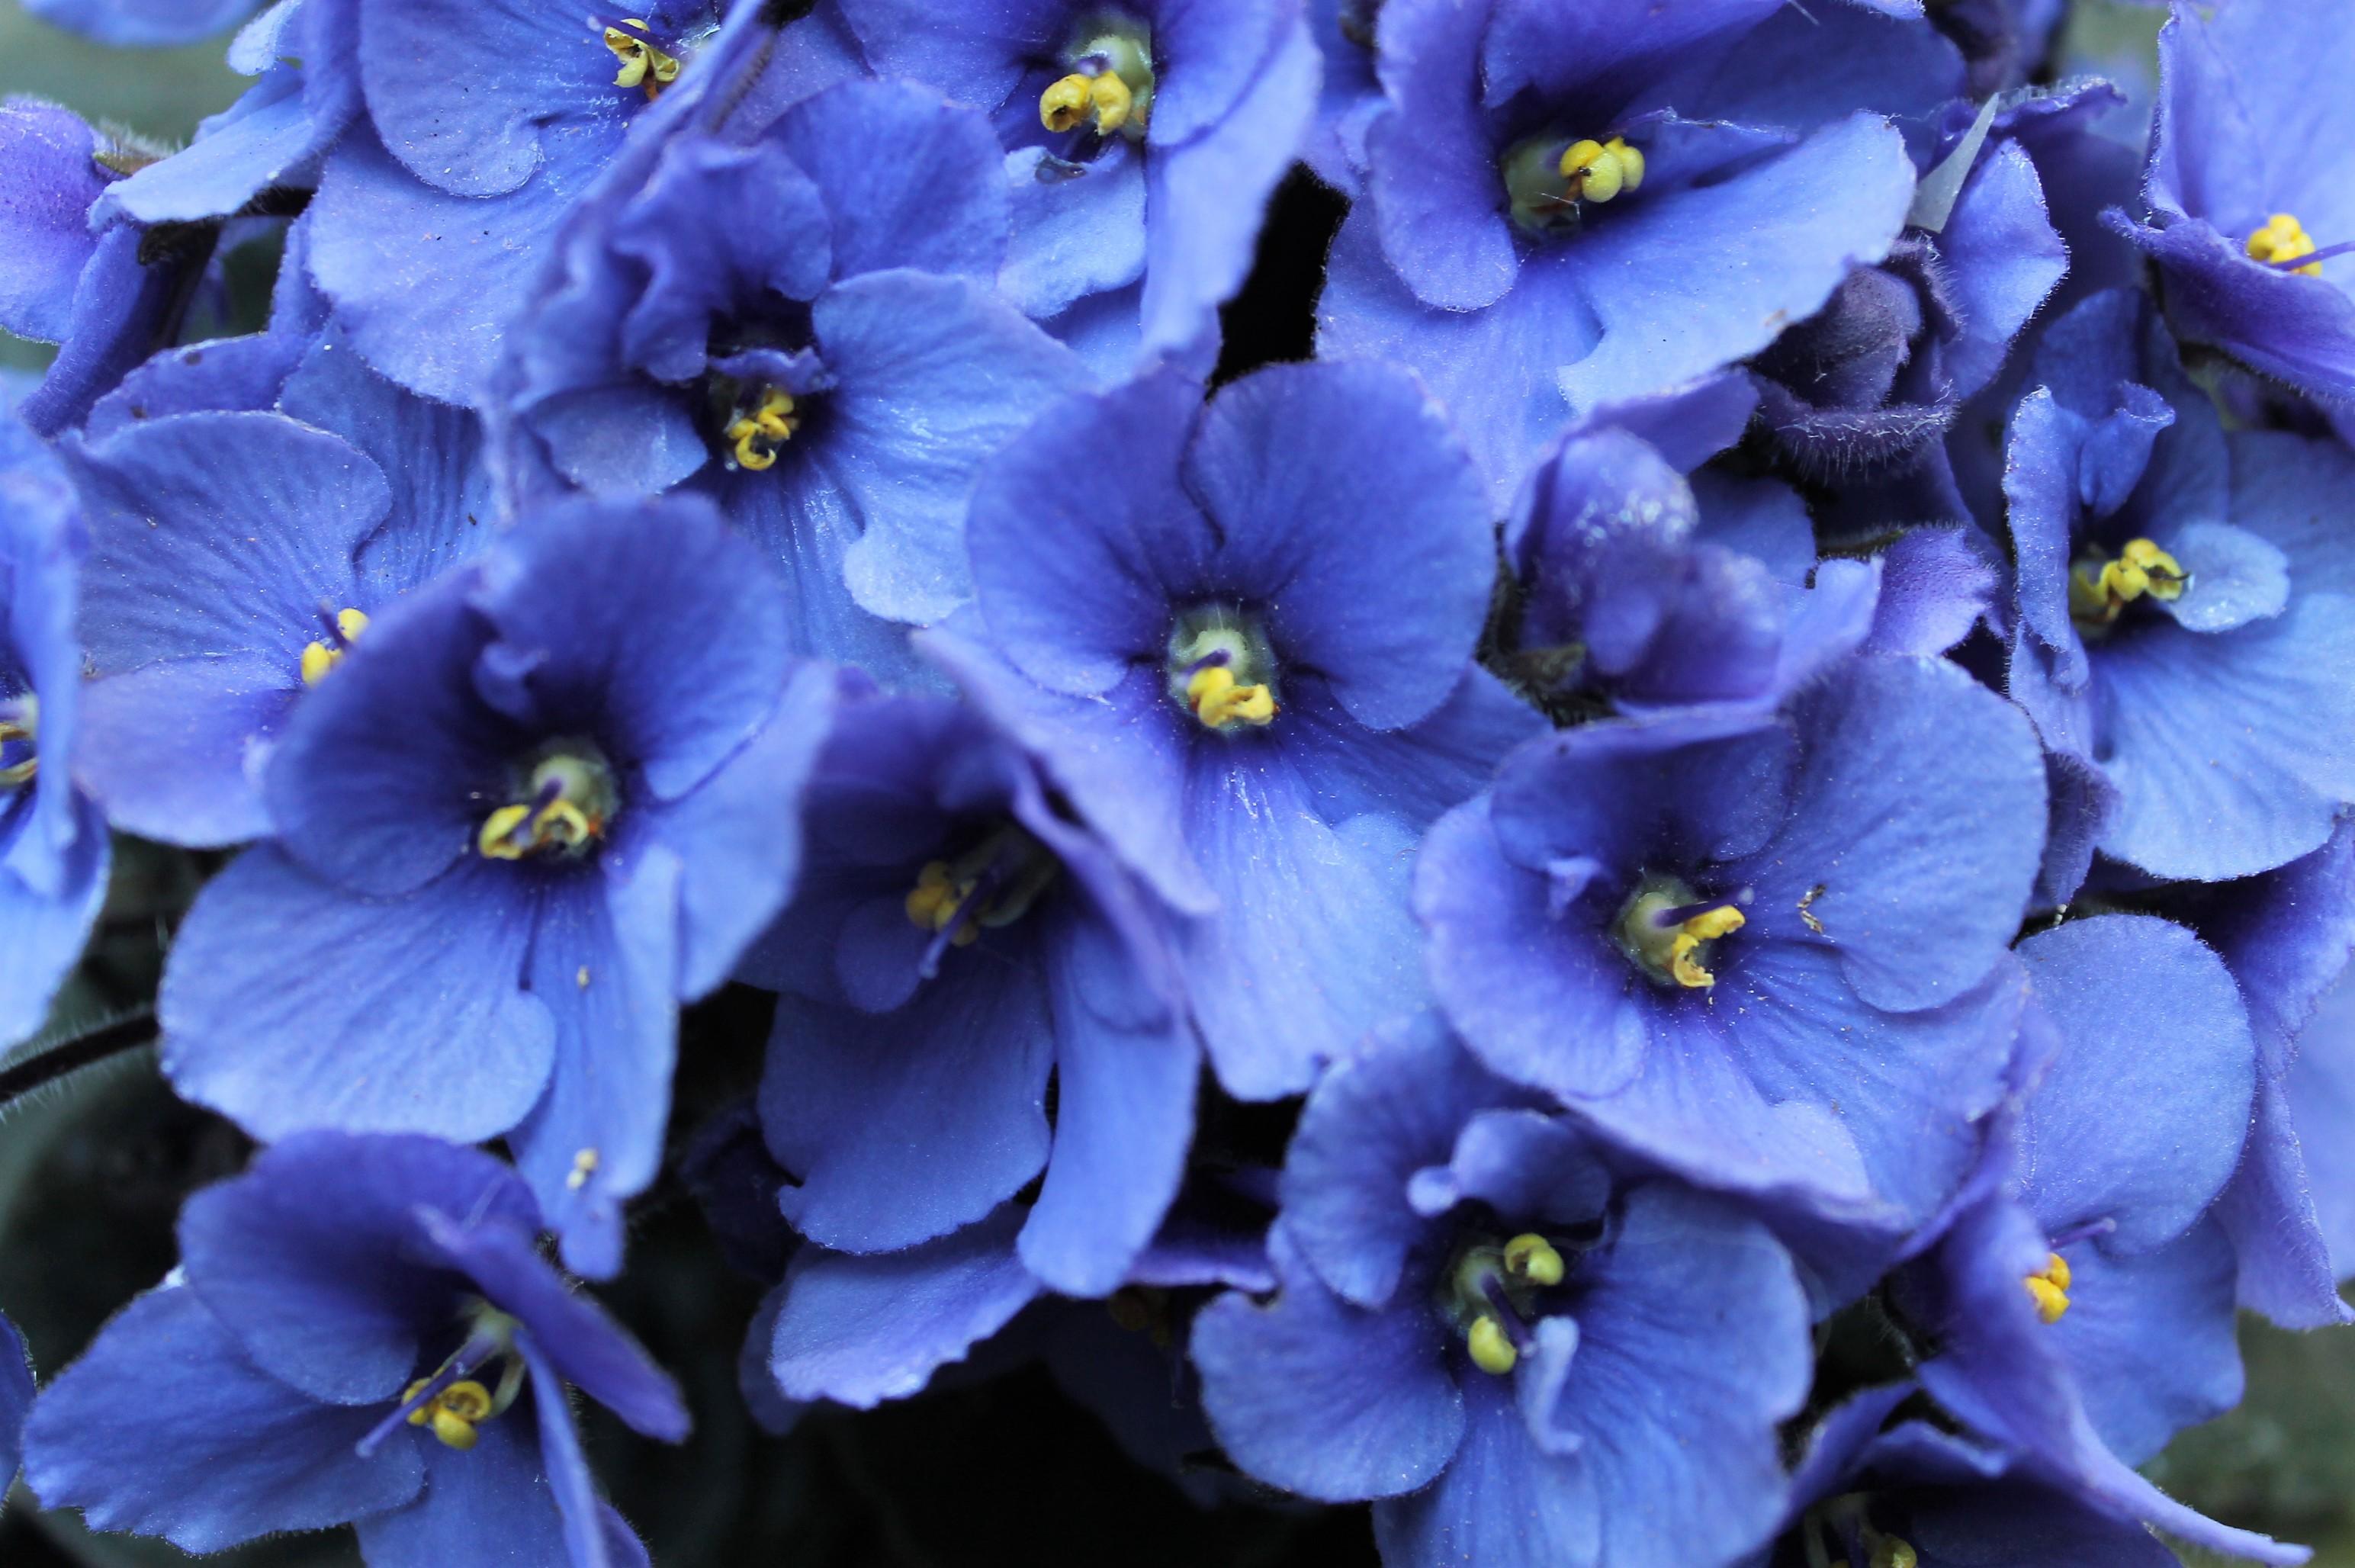 Gambar Bunga Bunga African Violet Tanaman Berbunga Biru Menanam Daun Bunga Ungu Biola Keluarga Violet Delphinium Tanaman Tahunan Tanaman Abadi 3088x2056 Peter Calleja 1590523 Galeri Foto Pxhere